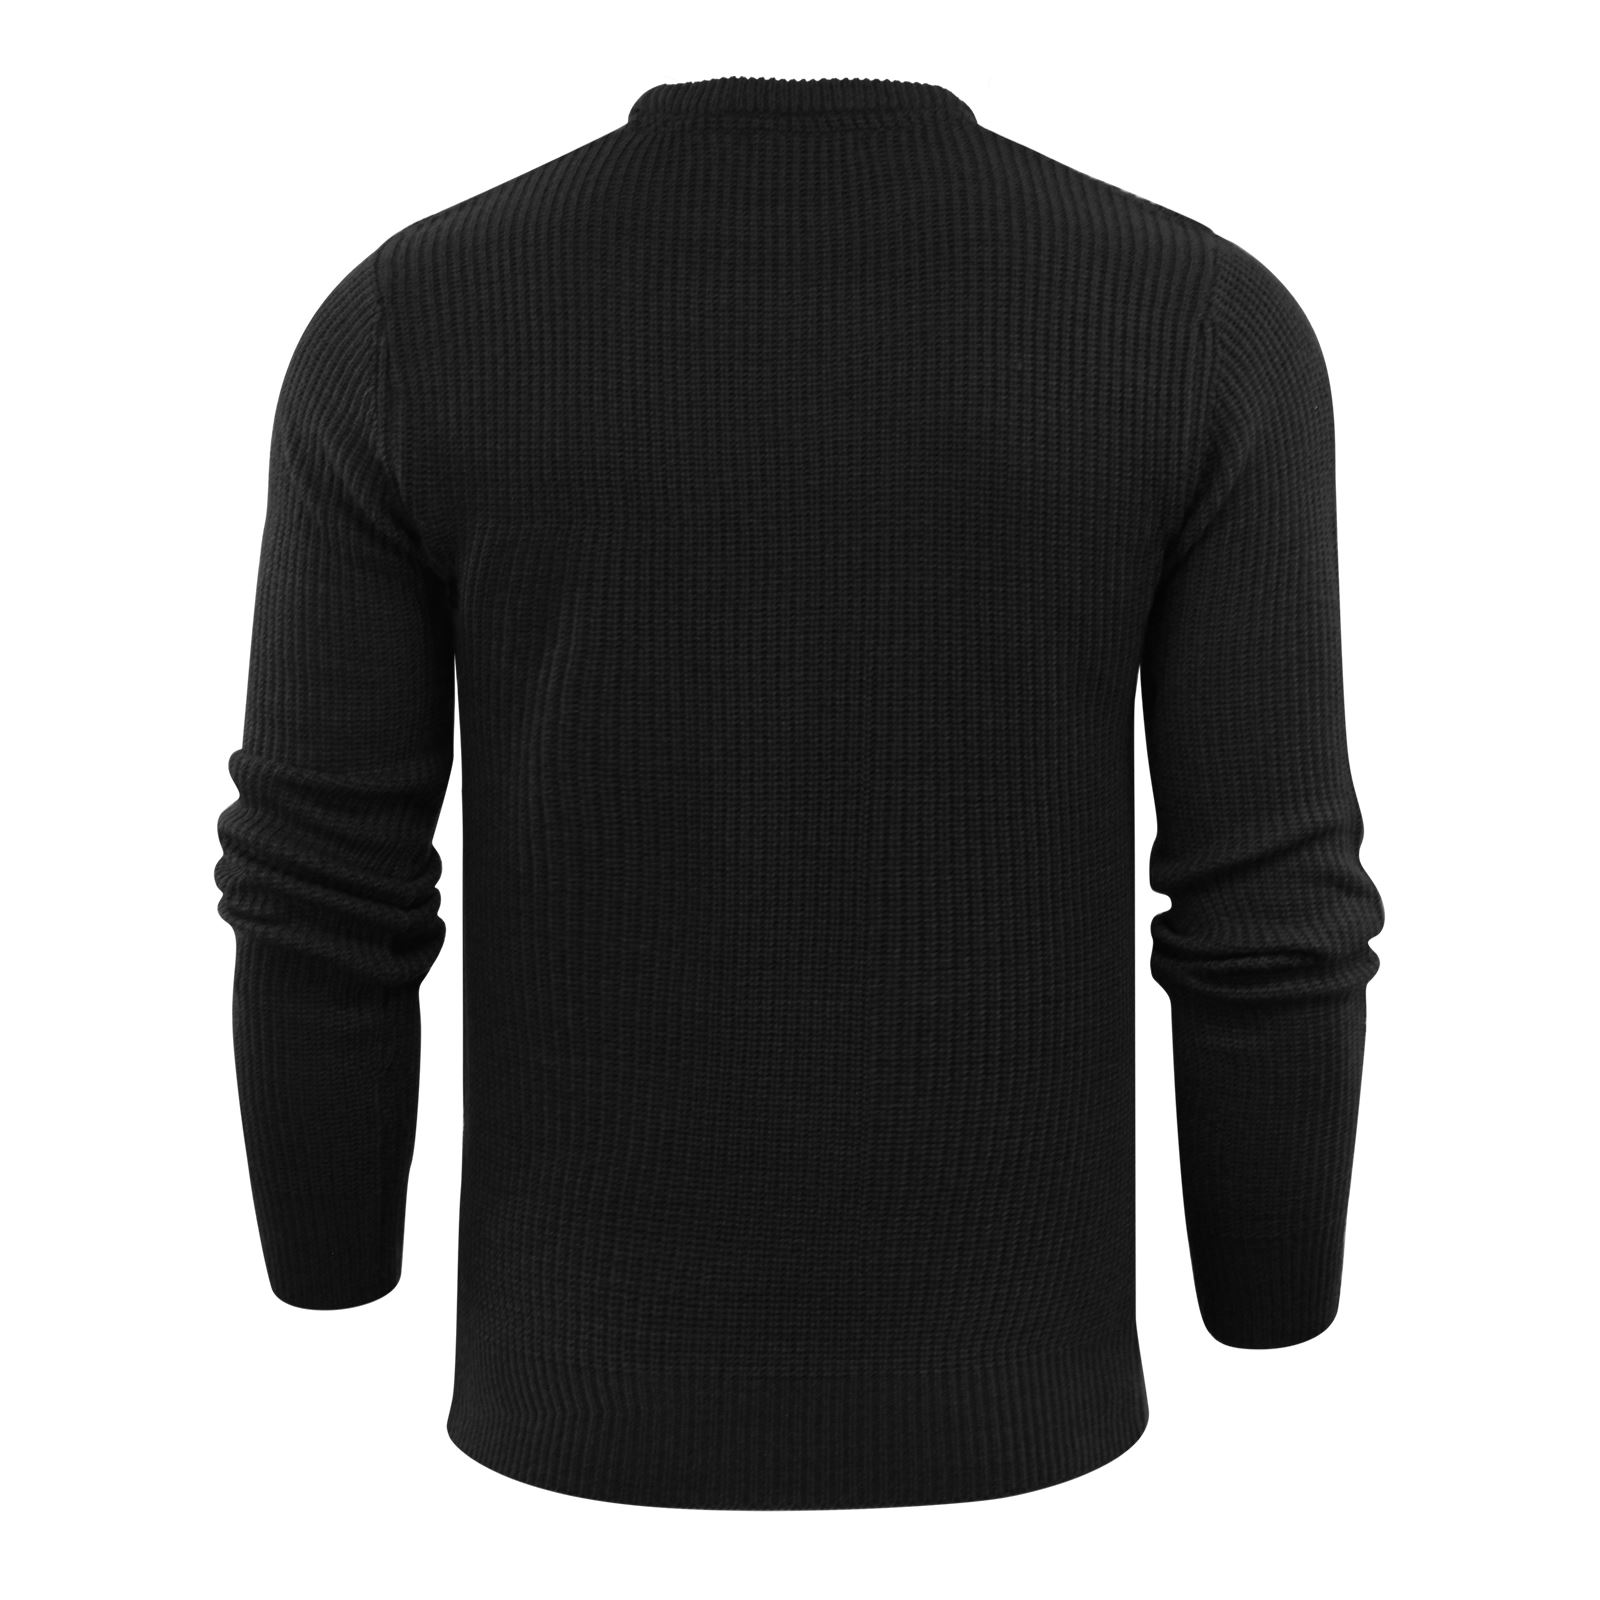 Mens Jumper Brave Soul Fulton Kintted Crew Neck Sweater